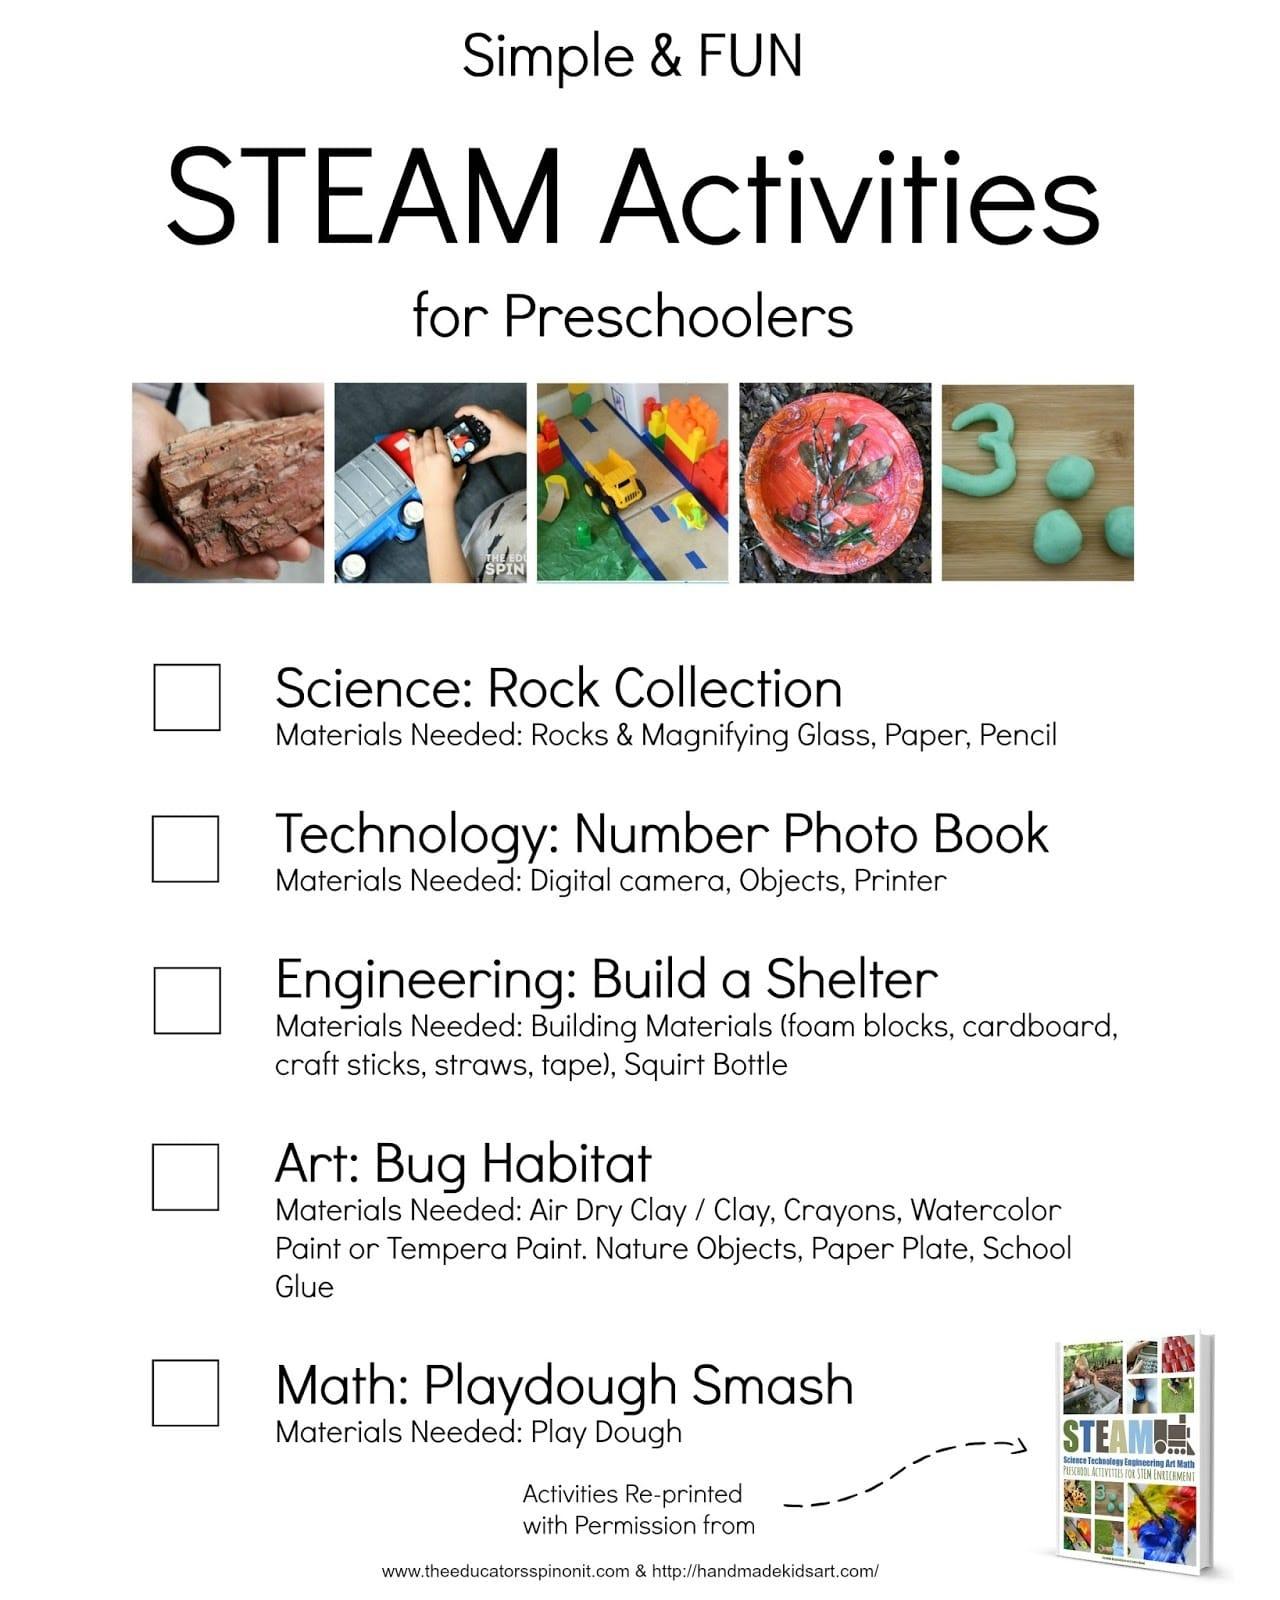 Simple And Fun Steam Activities For Preschoolers - The Educators - Free Printable Stem Activities